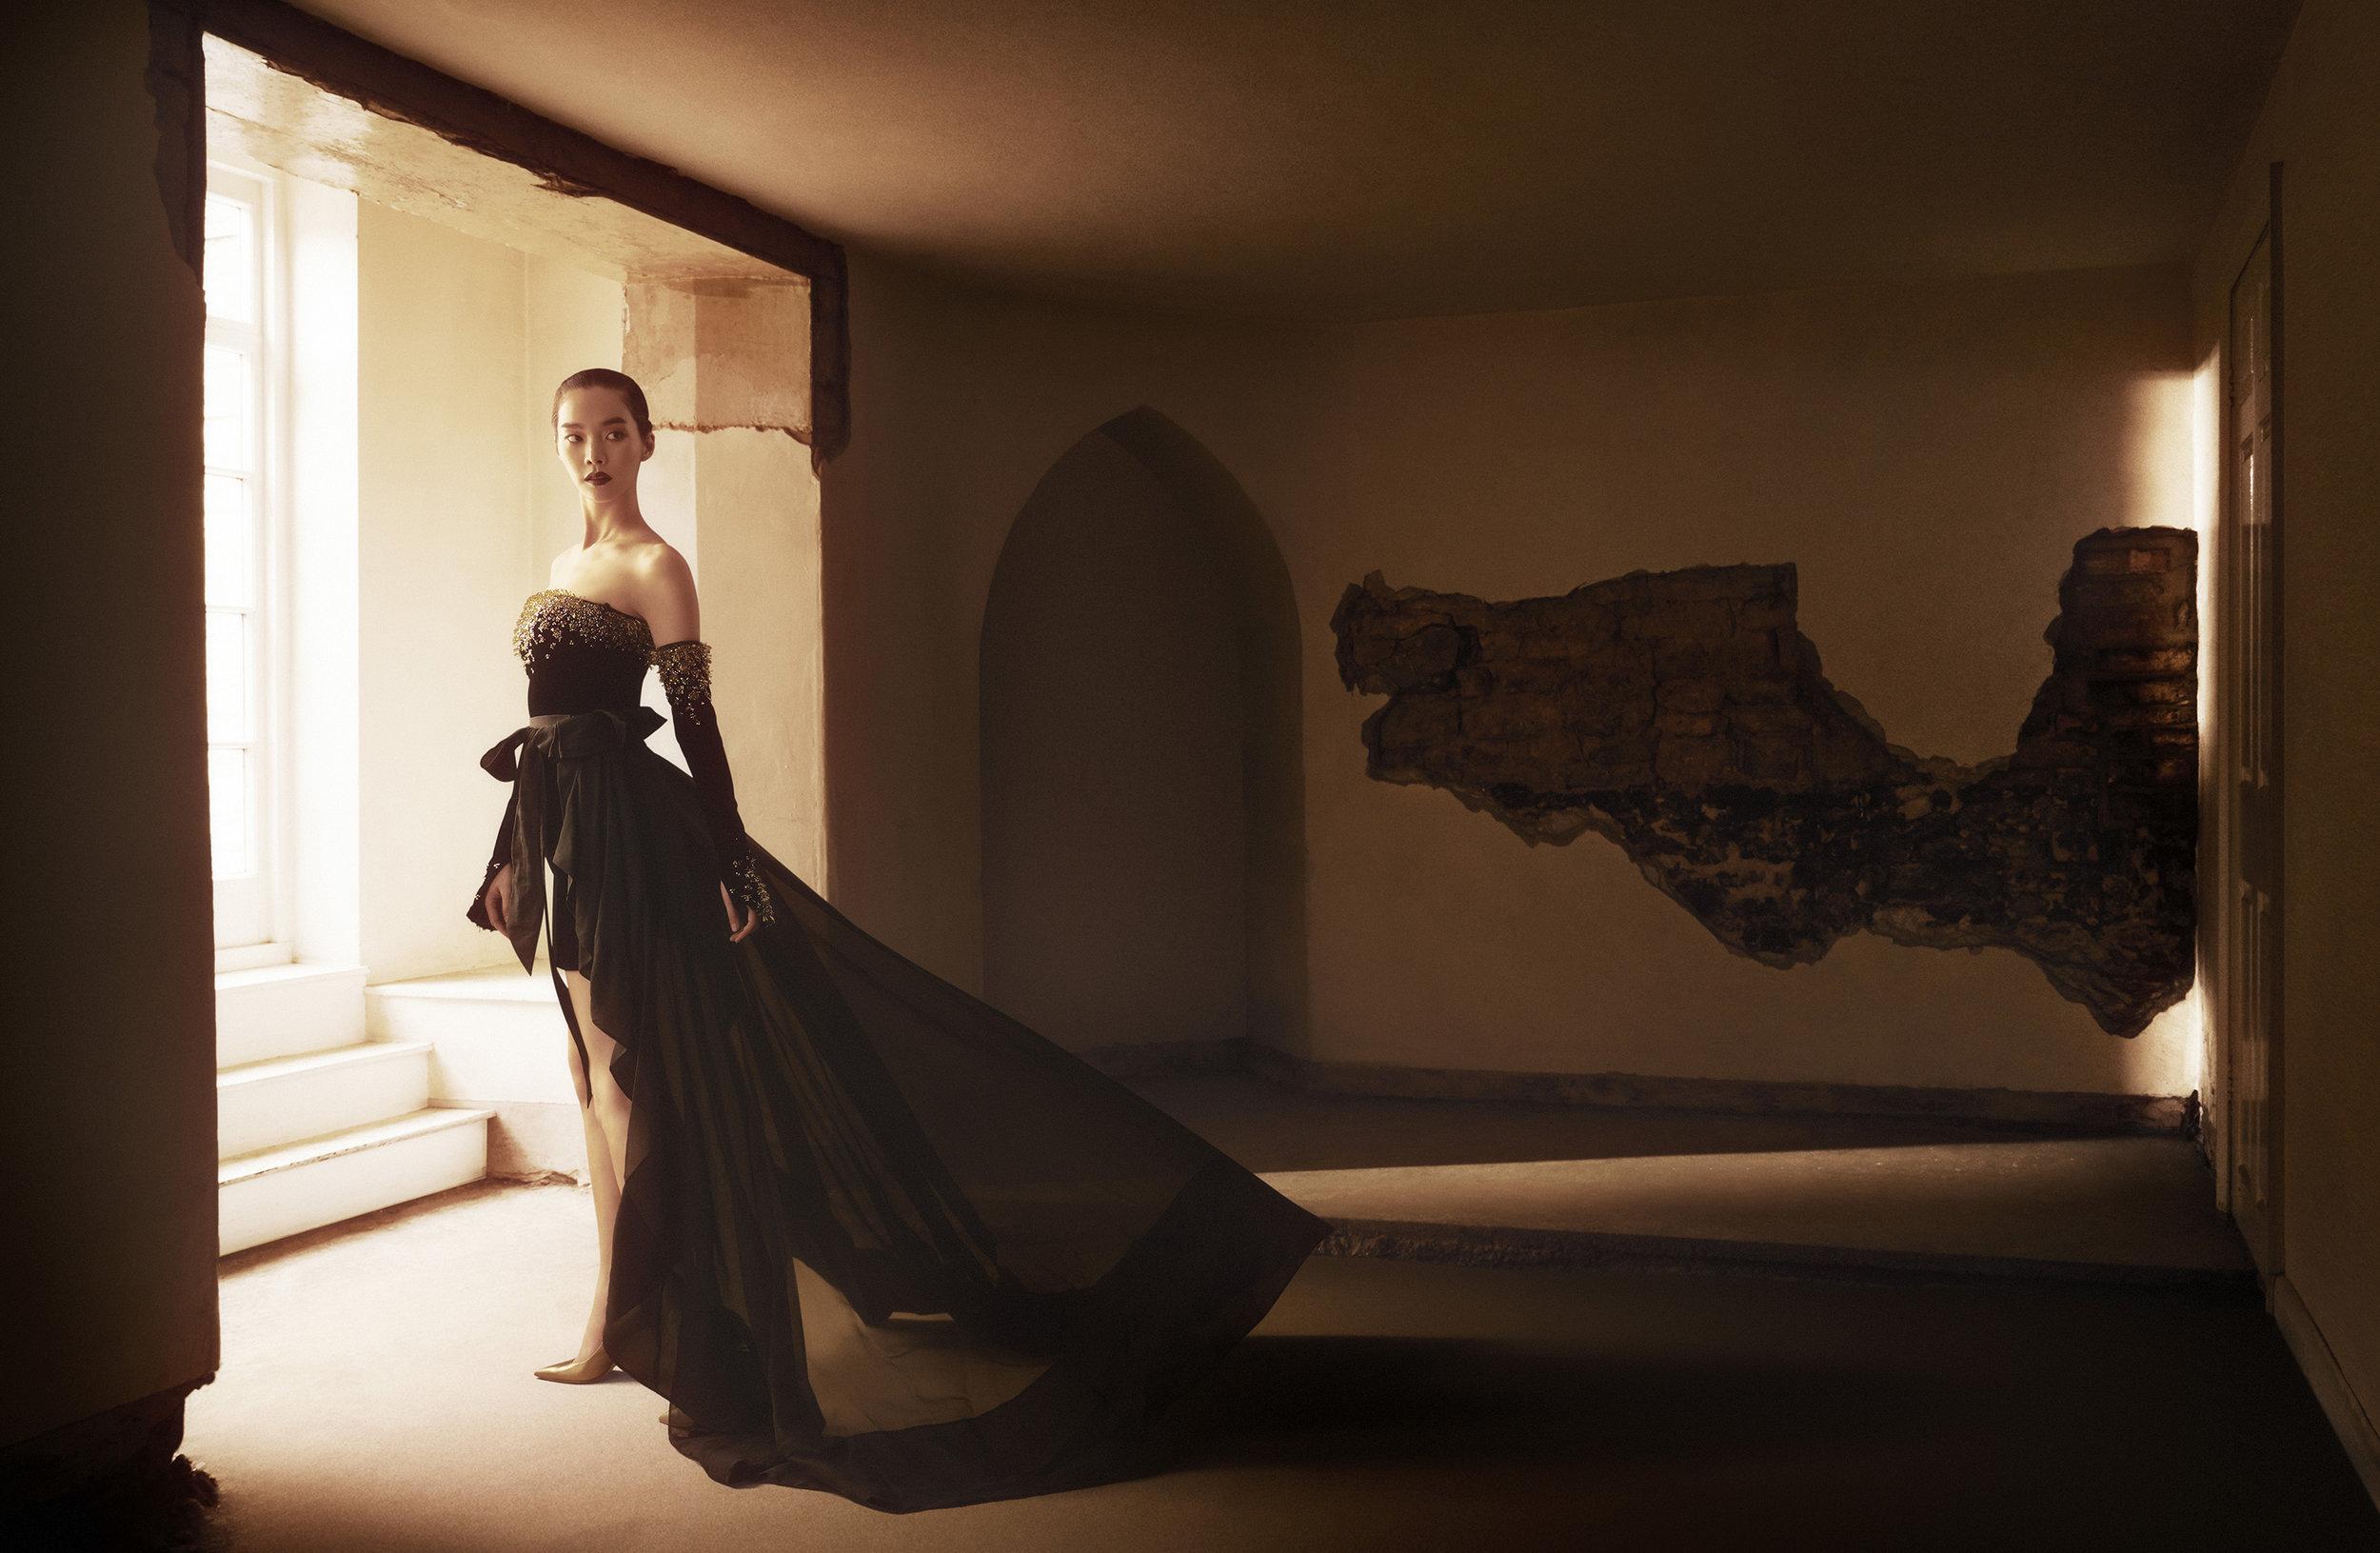 Ralph&Russo / Luxure Magazine / George McLeod